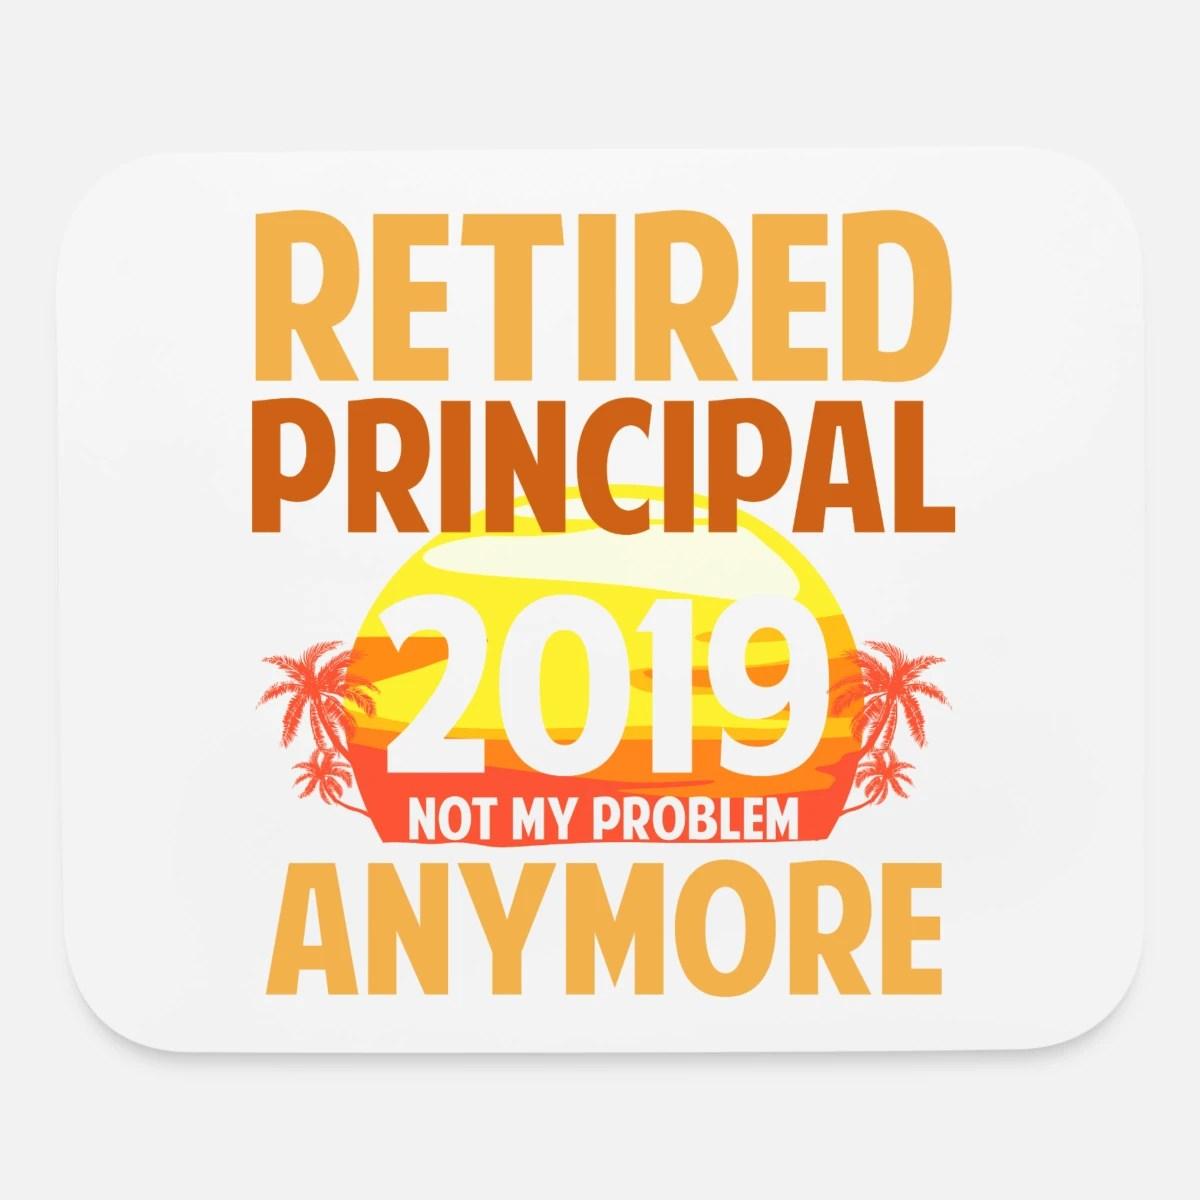 retired principal 2019 funny